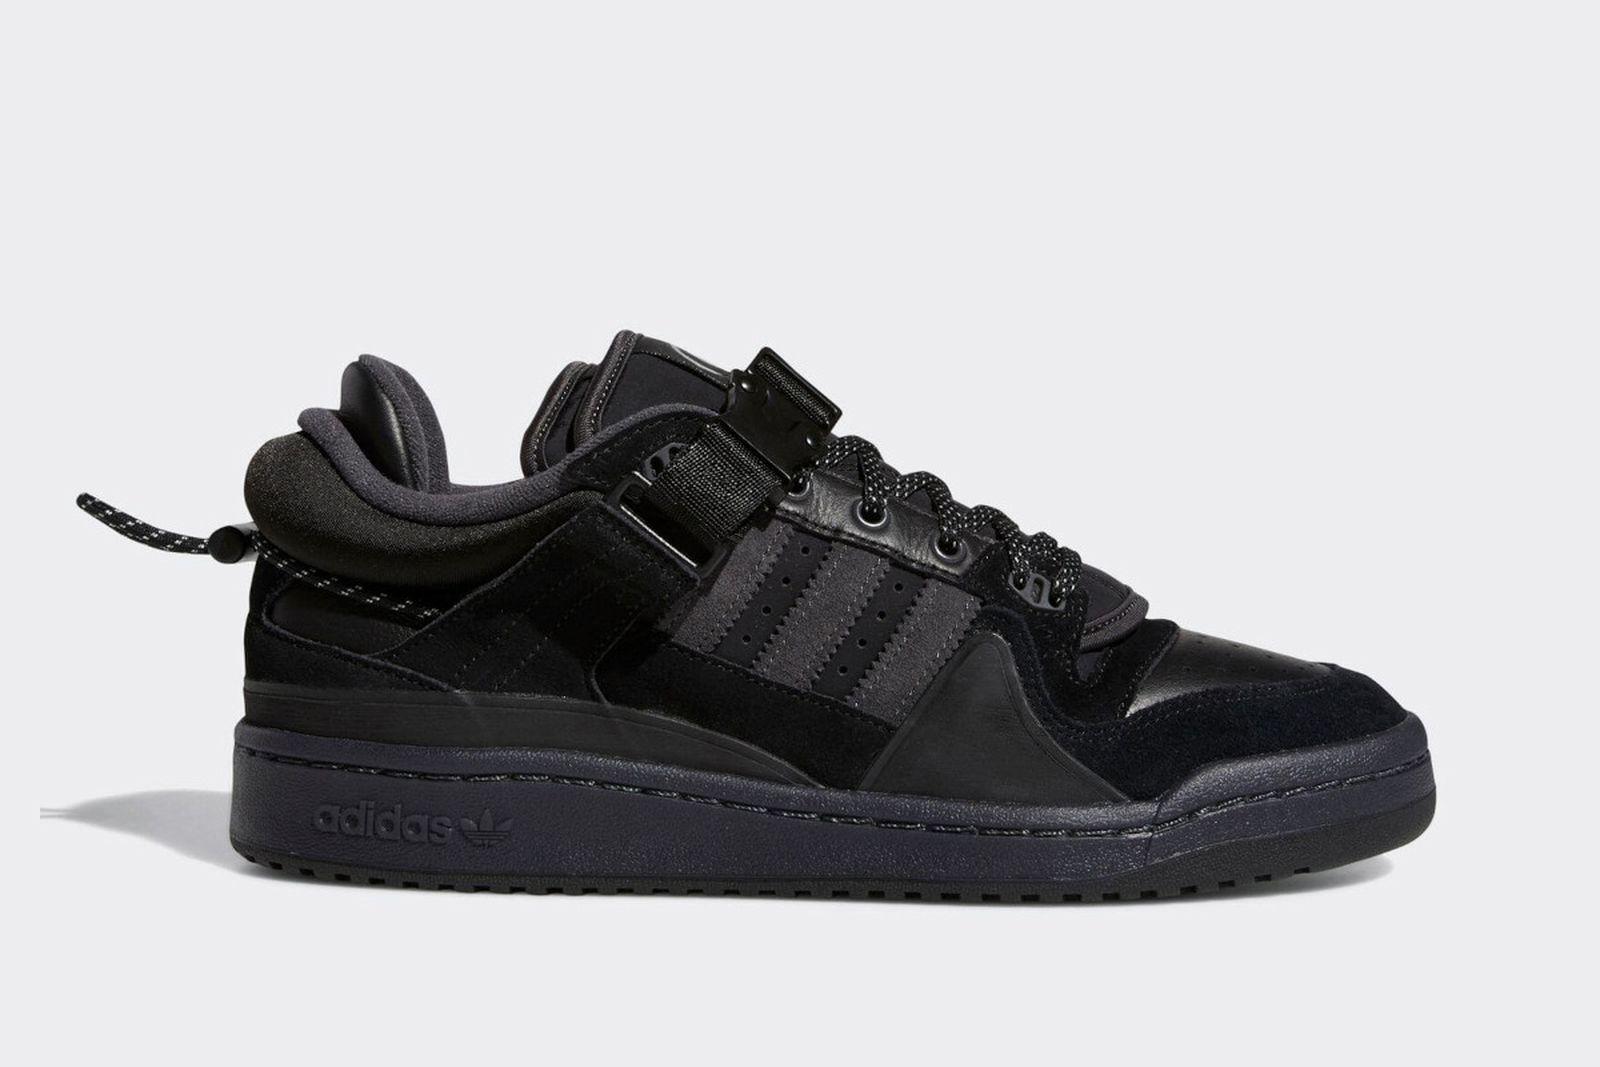 bad-bunny-adidas-originals-forum-low-triple-black-release-date-price-02